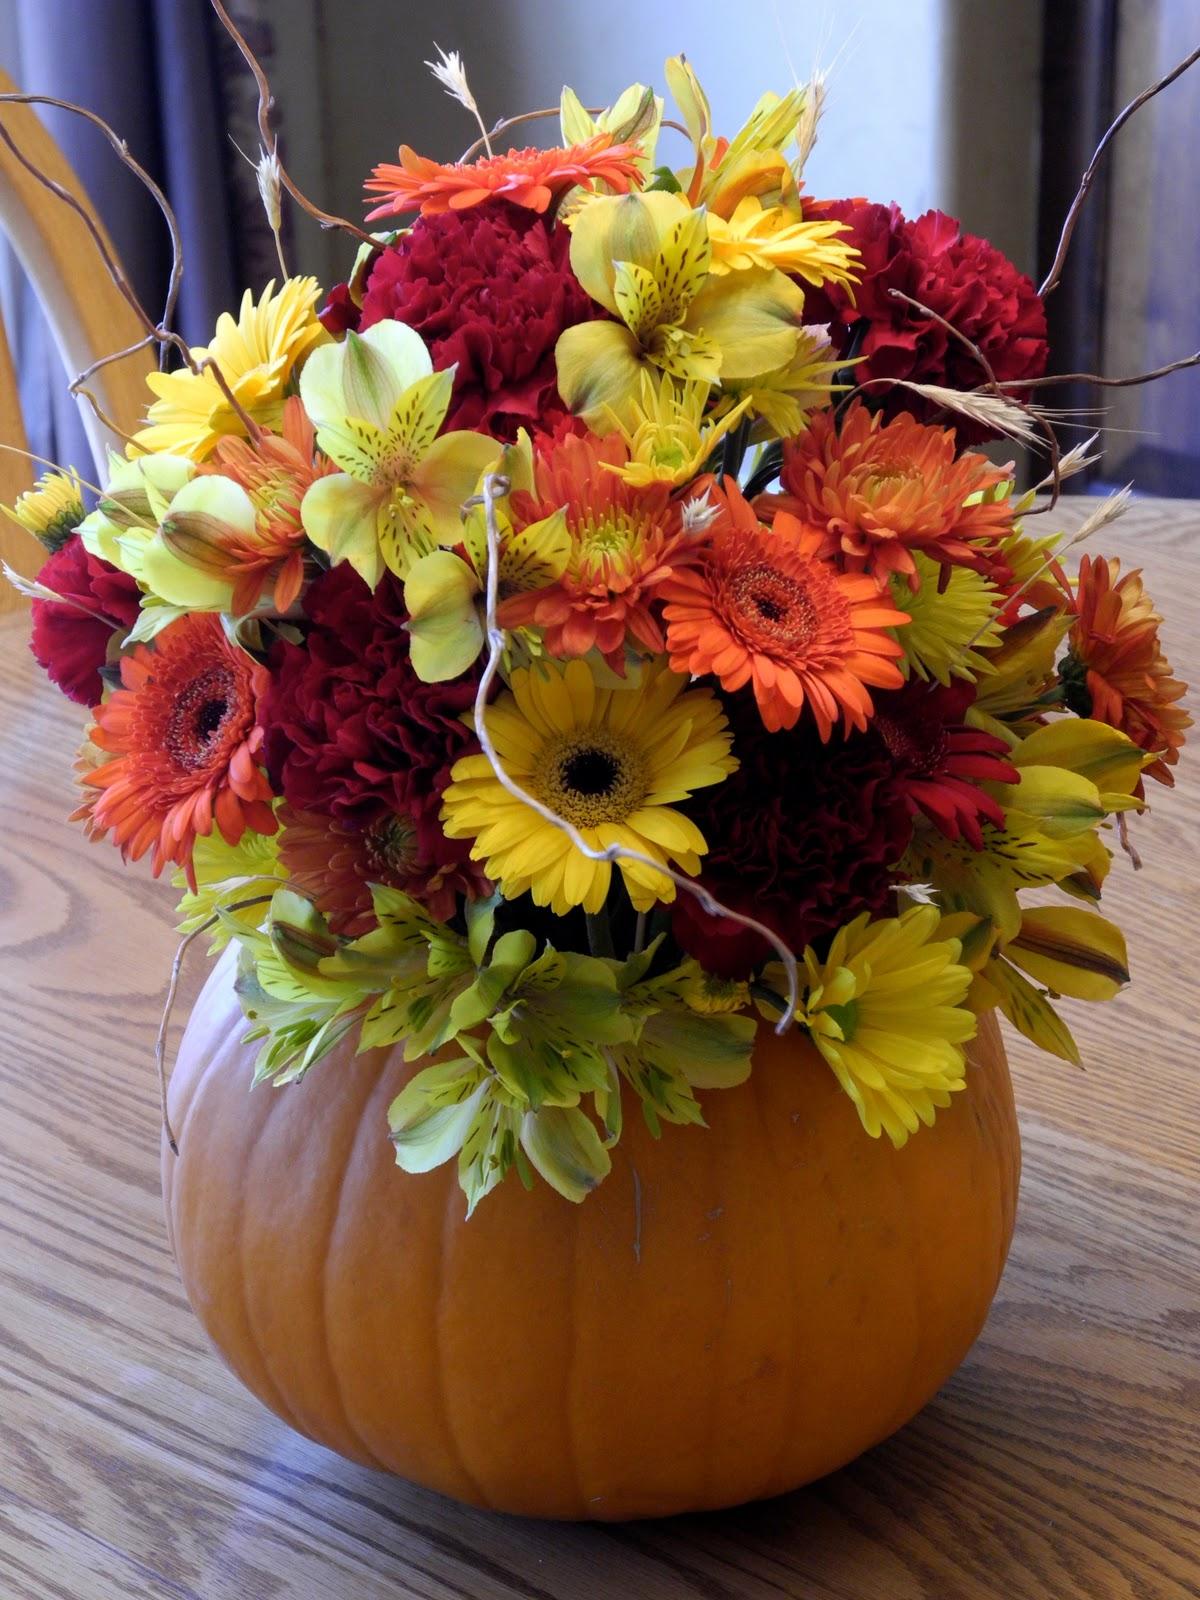 The flower girl fall flowers and a pumpkin